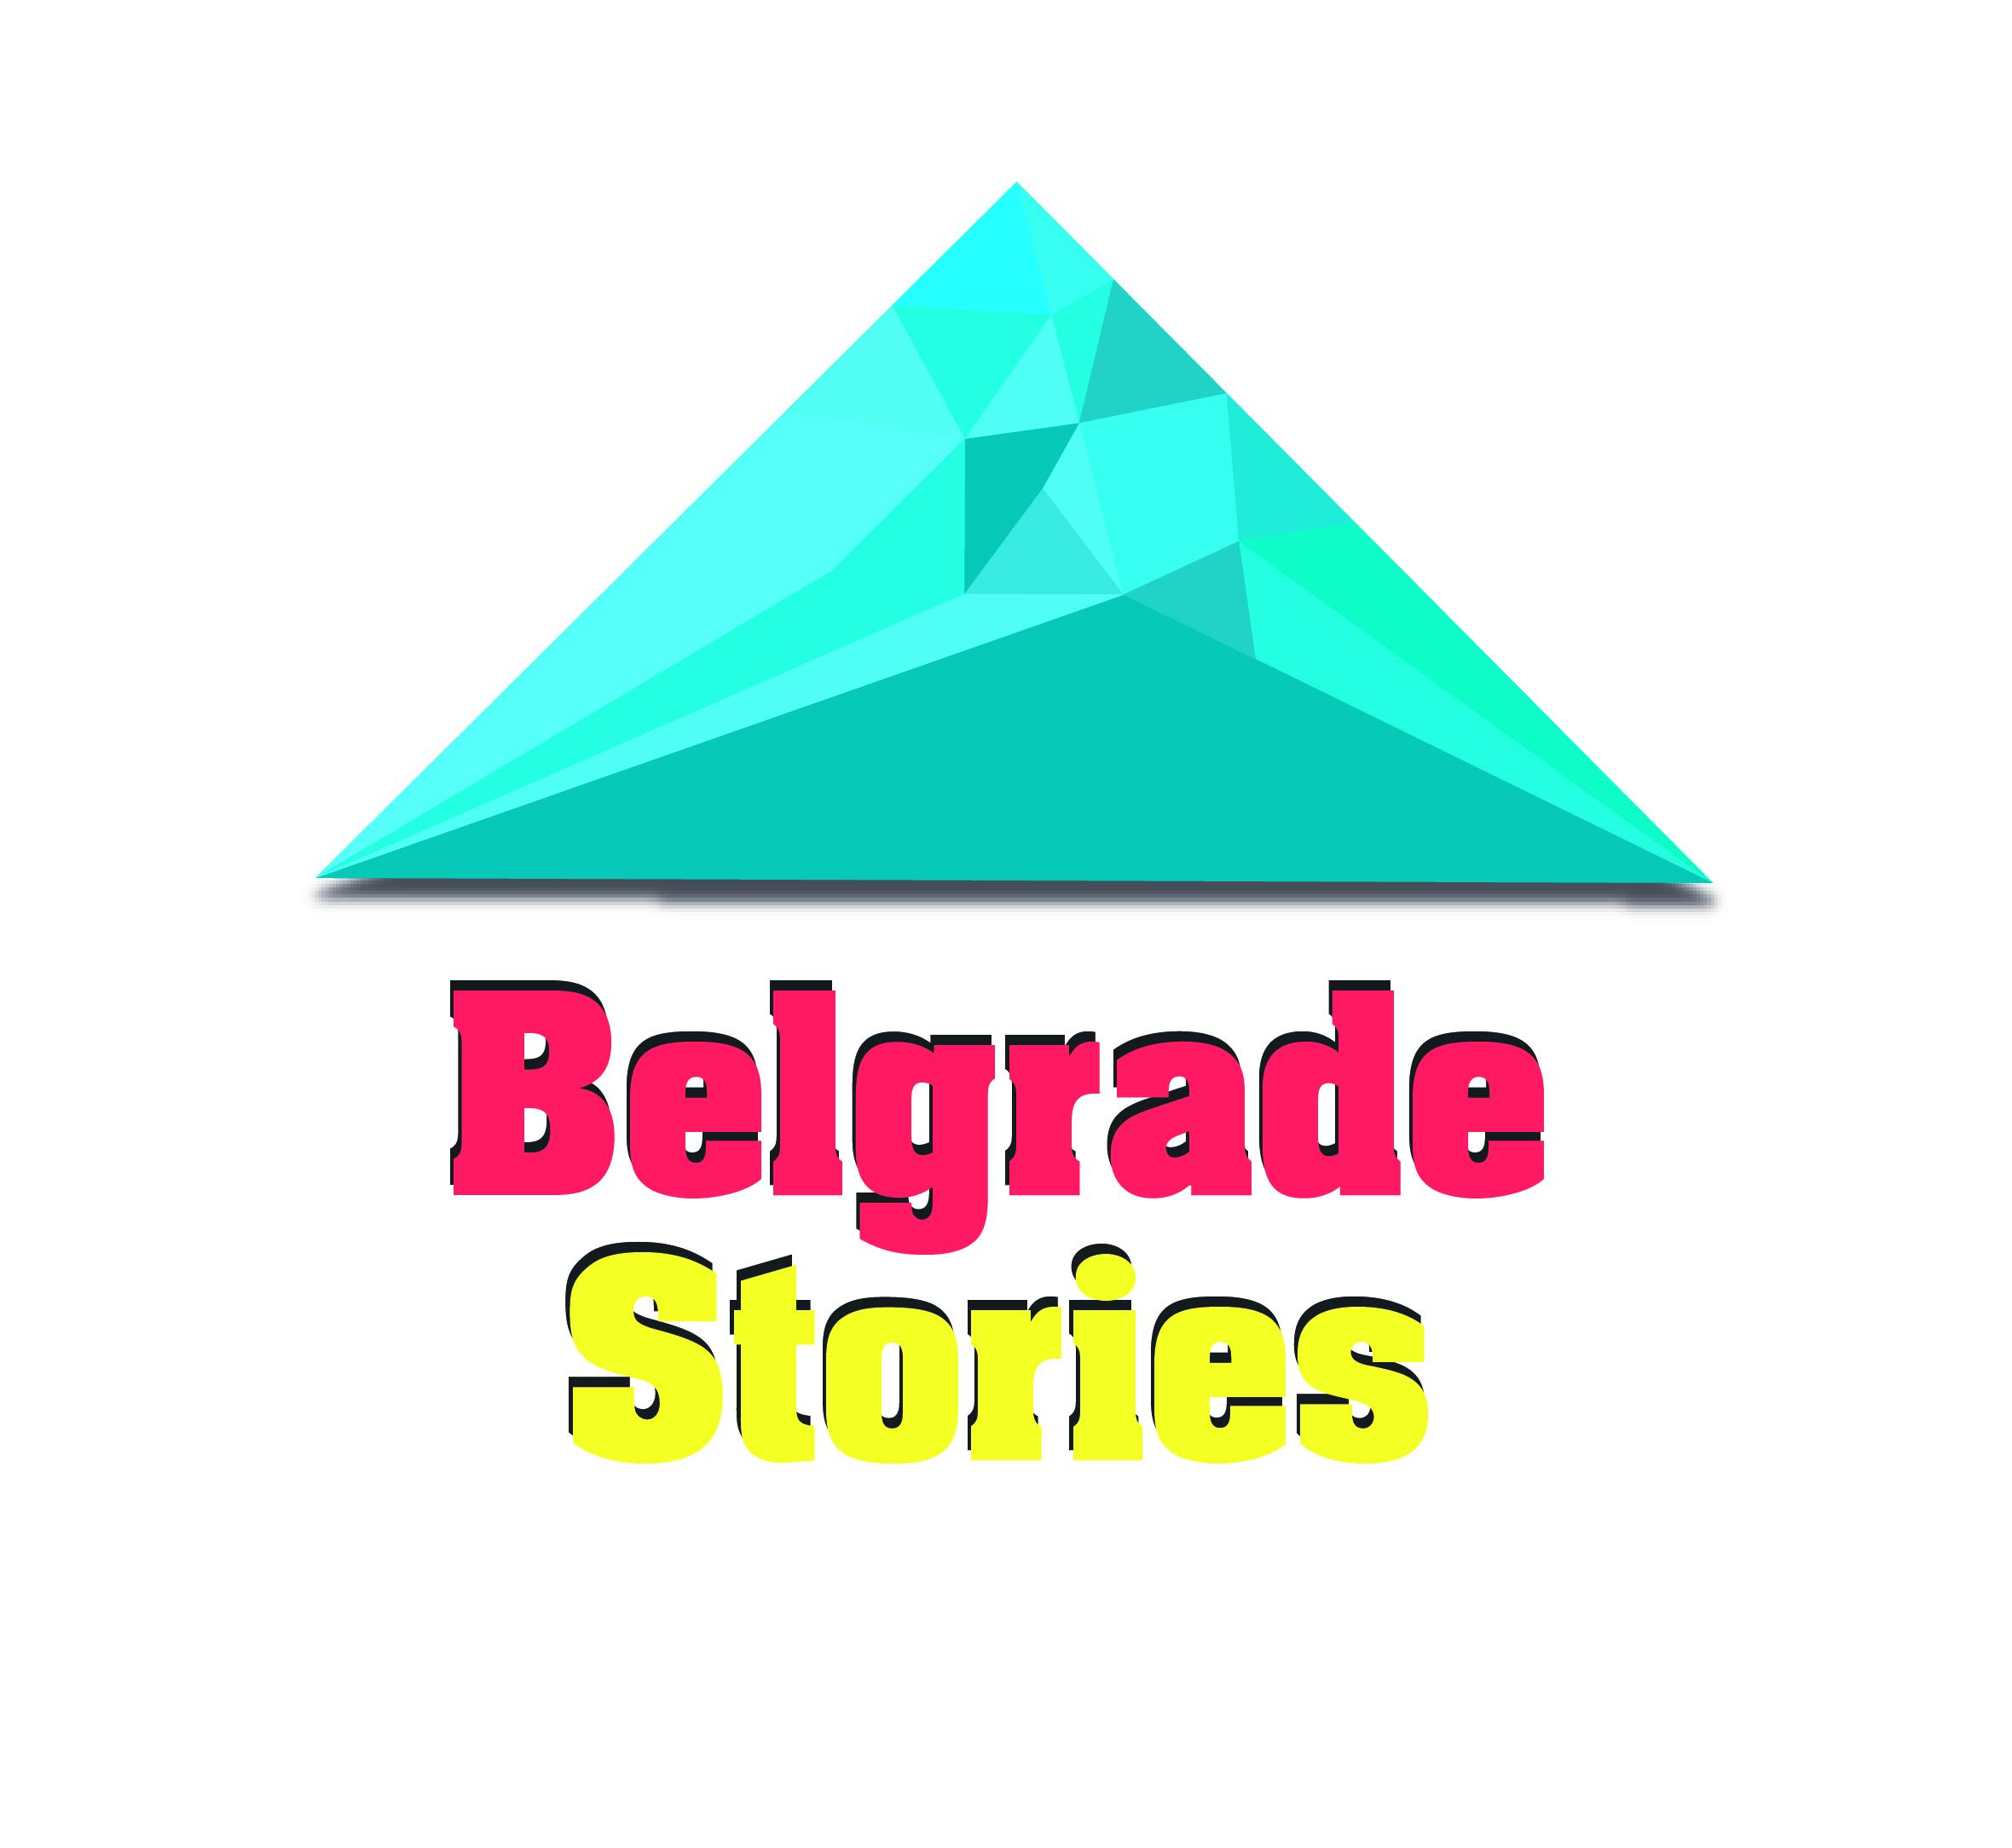 Логотип для агентства городских туров в Белграде фото f_431589b1e8c4427c.jpg